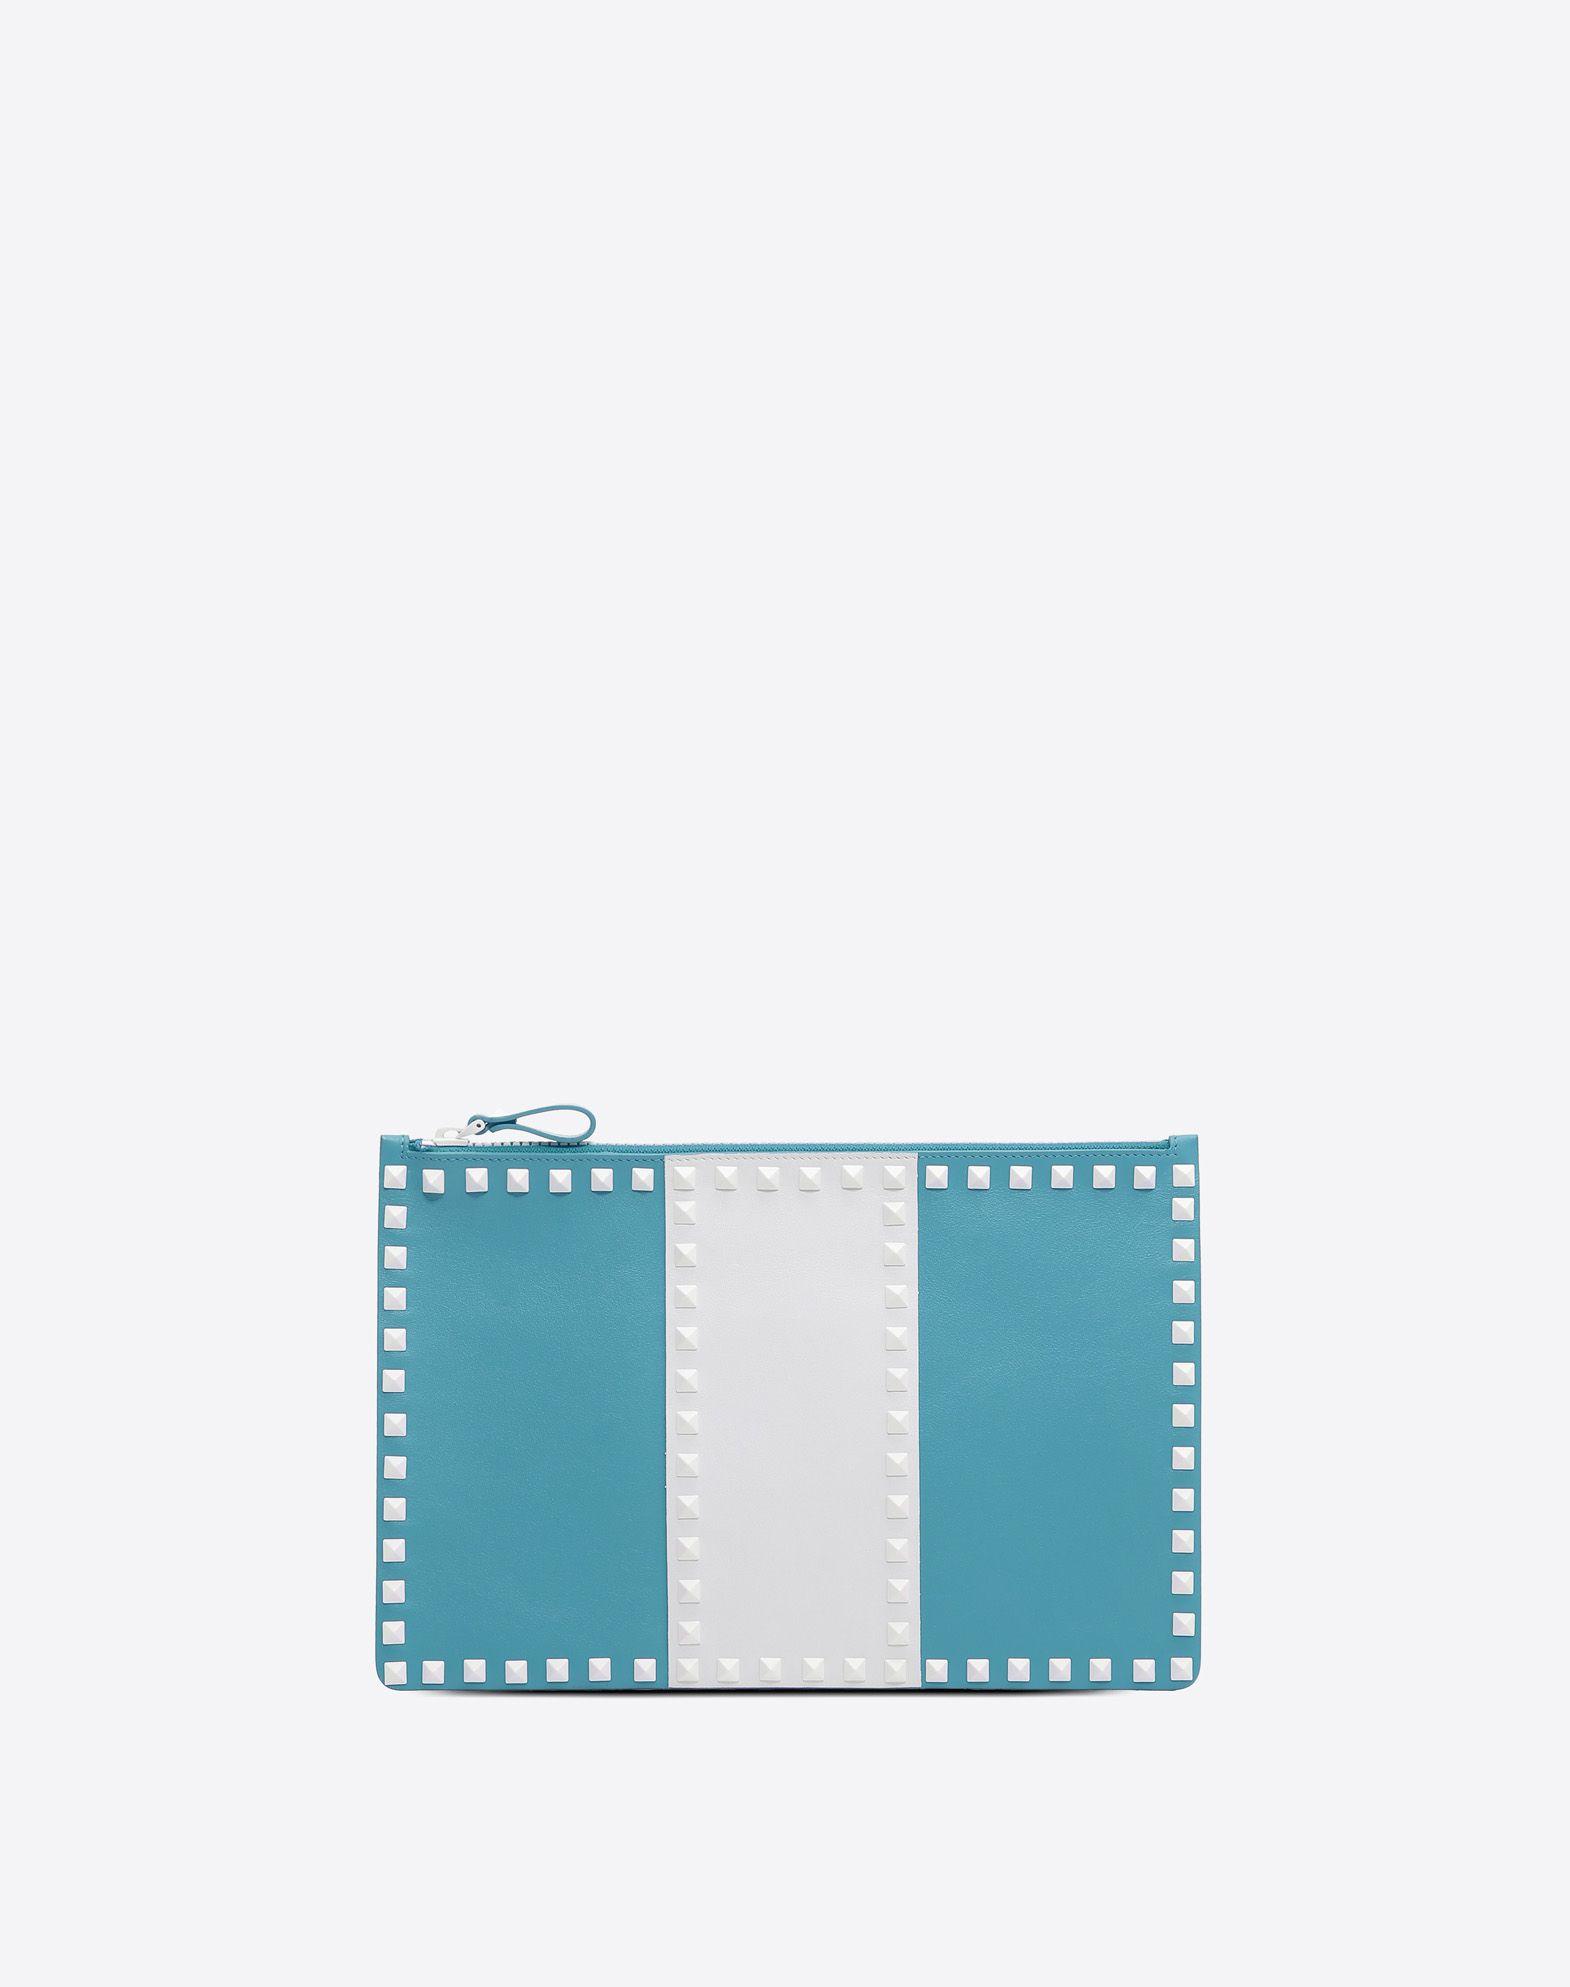 VALENTINO 铆钉 双色图案 附品牌标志 拉链 全里衬  46549566tx